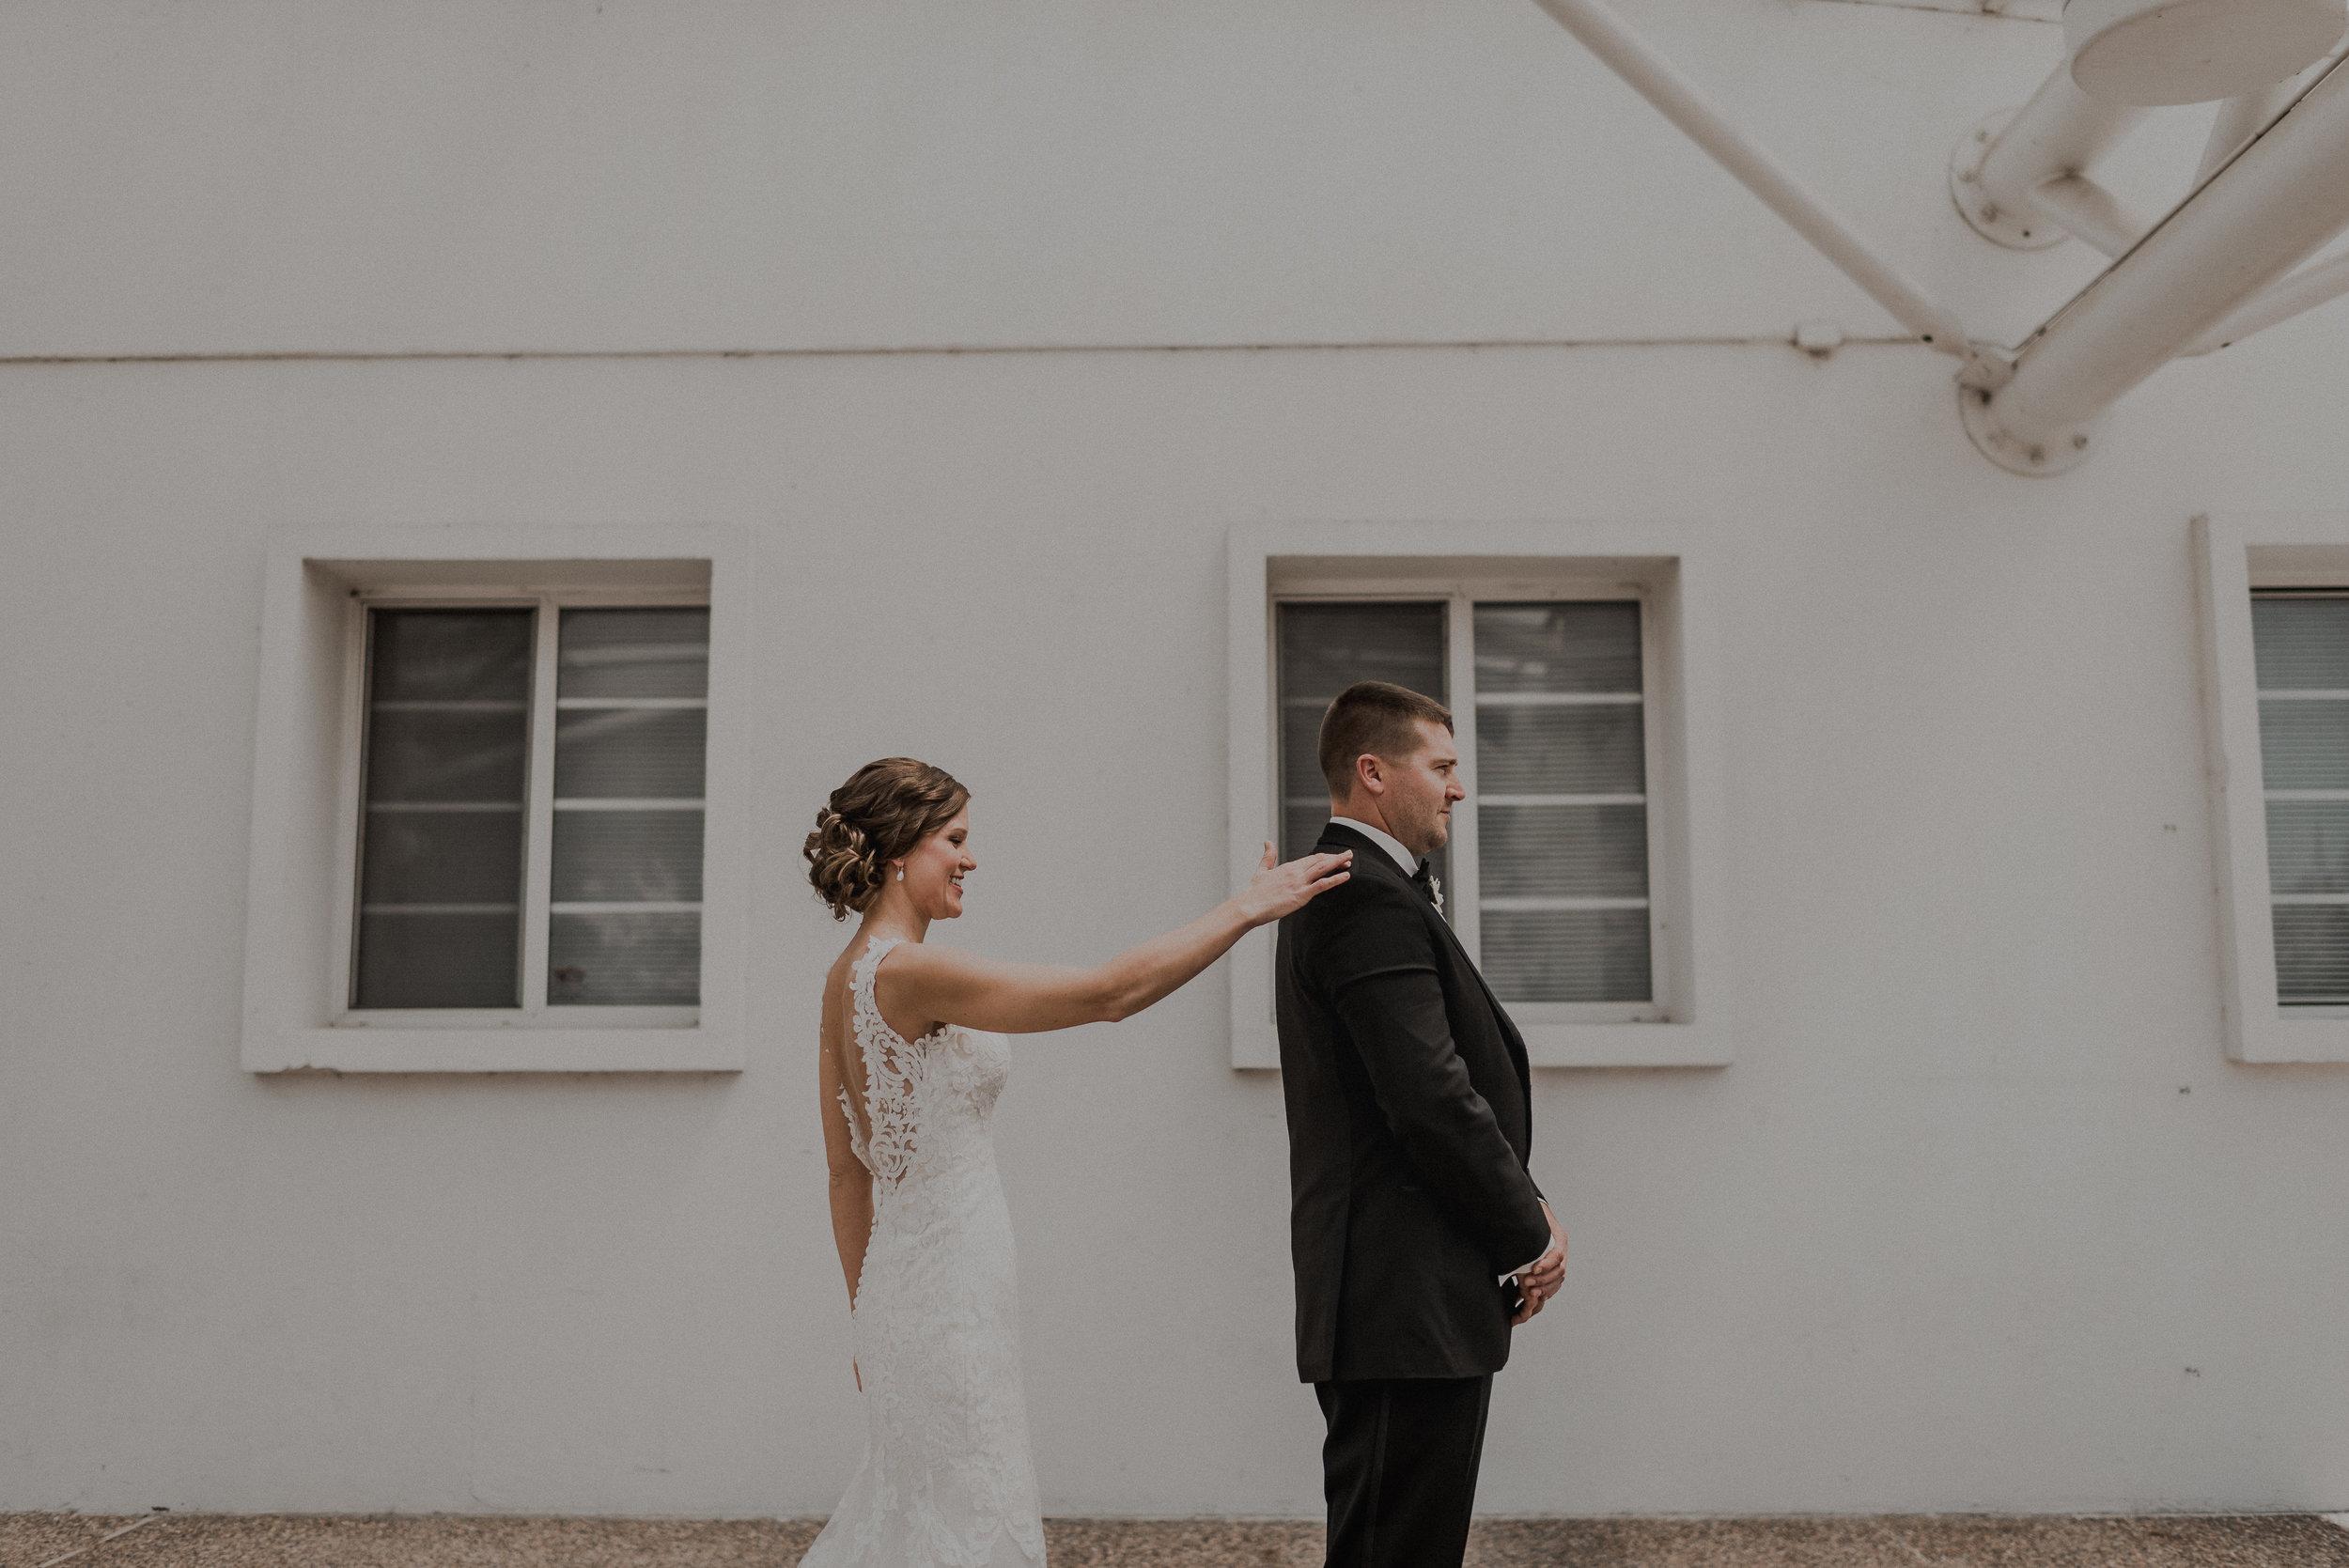 Melissa Cervantes Photography Iowa, Midwest + Destination Wedding Photographer - Dustin + Ashley-67.jpg